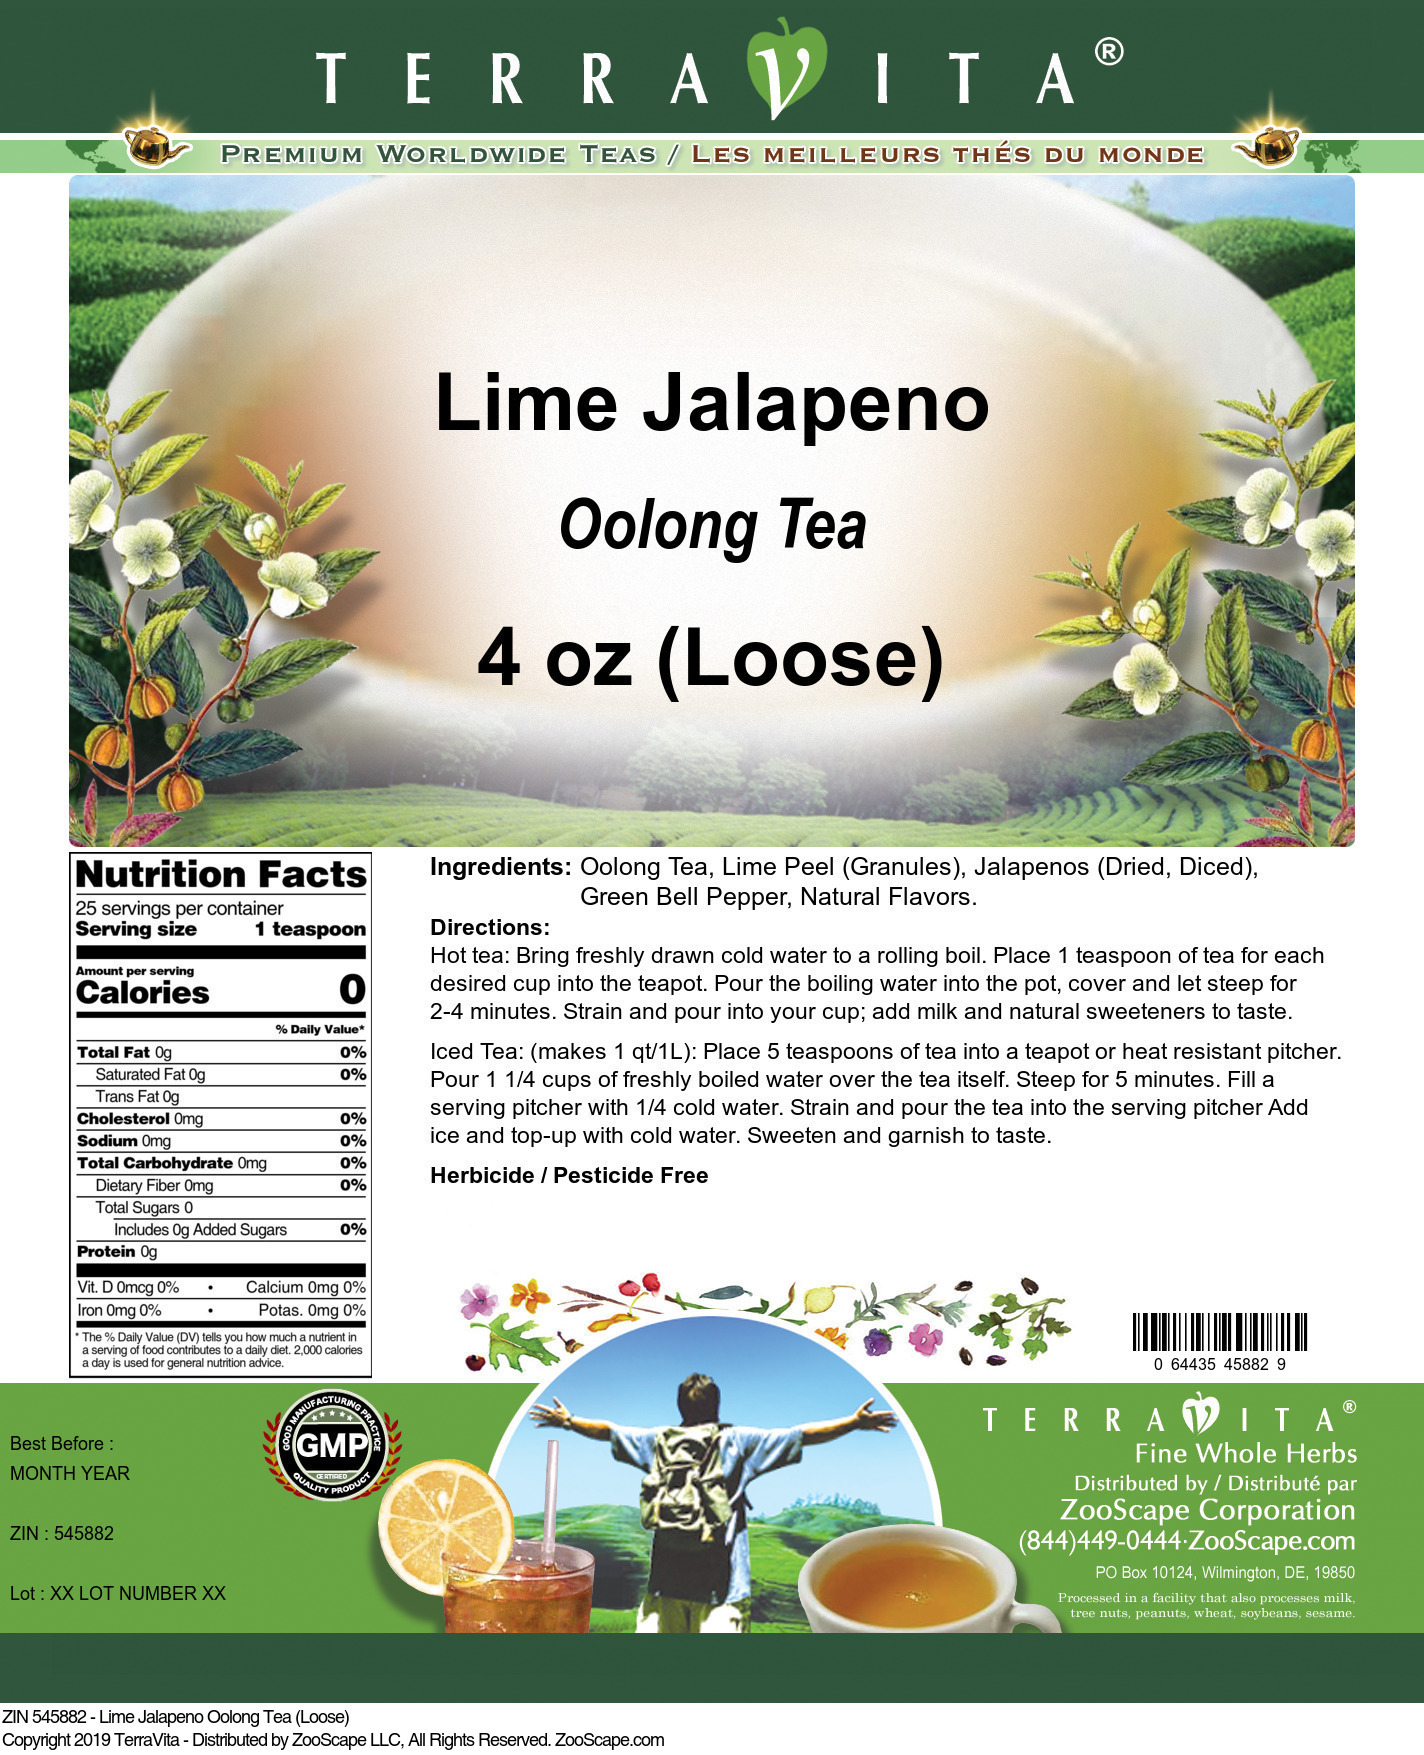 Lime Jalapeno Oolong Tea